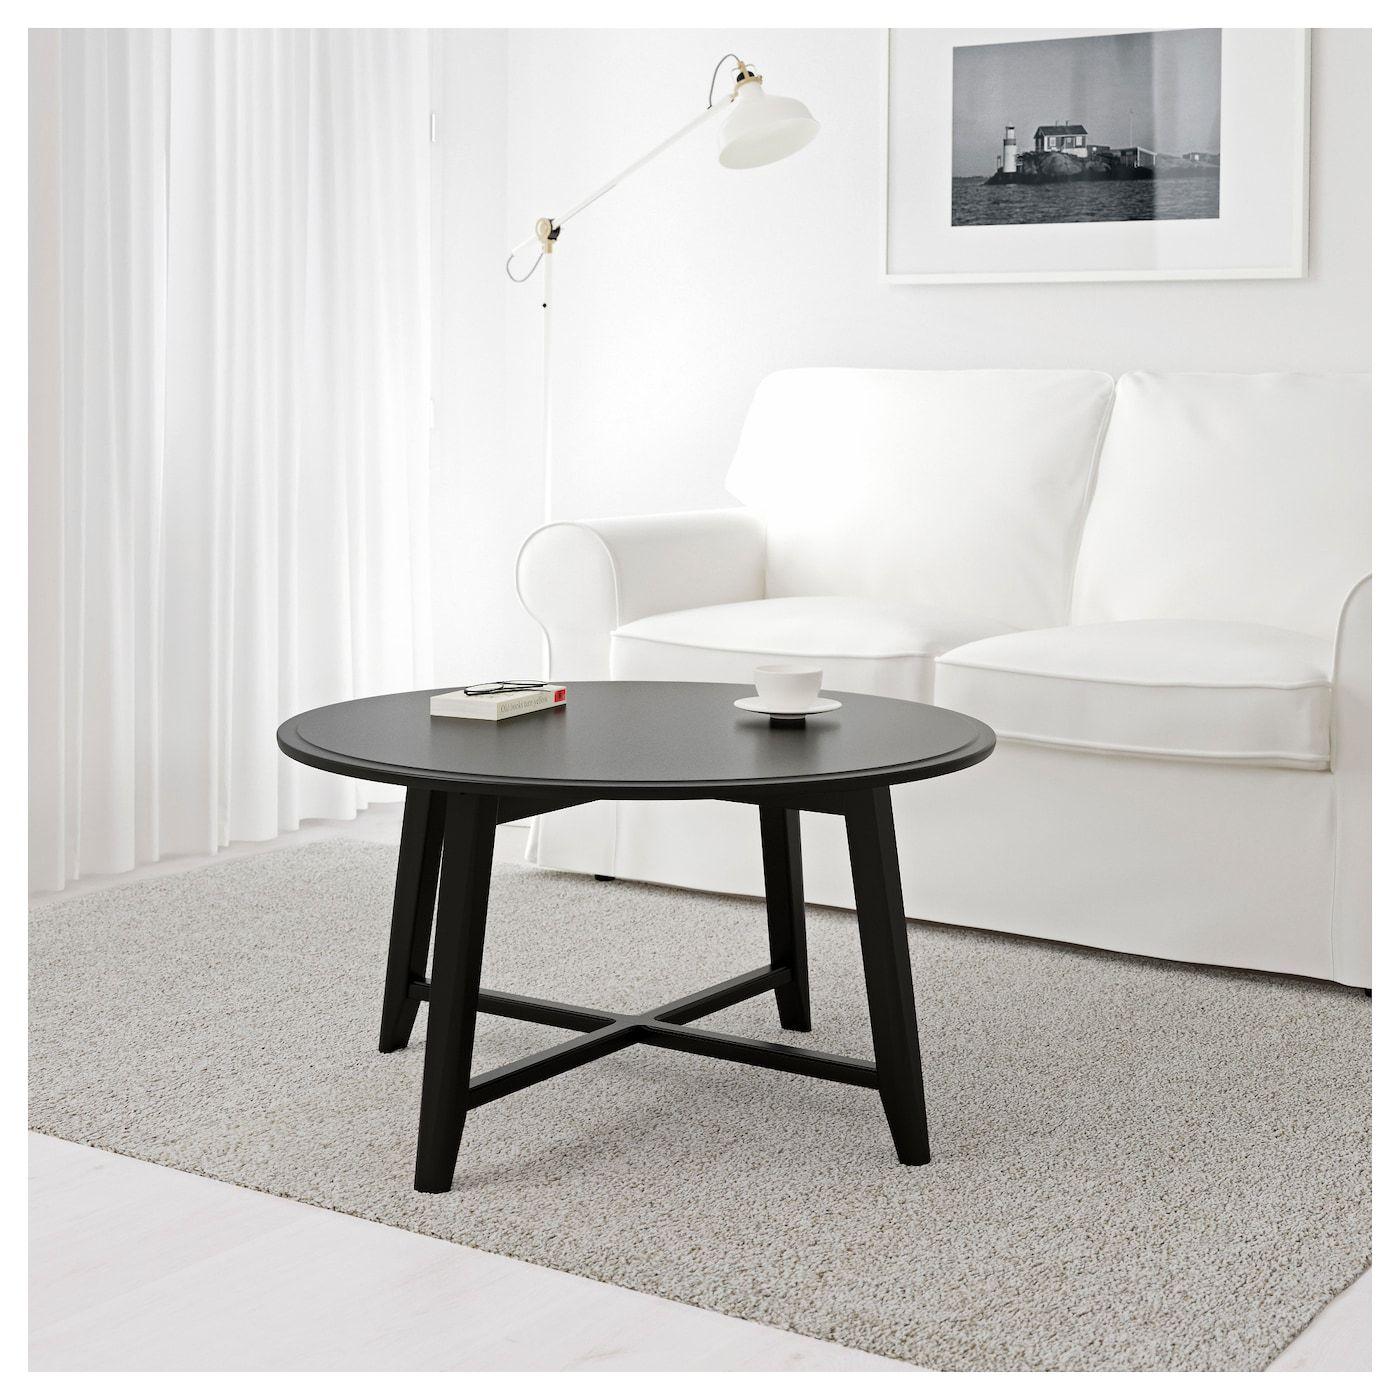 Https Www Ikea Com No No P Kragsta Bord Svart 80262253 Ikea Kaffebord Stuebord Bordben [ 1400 x 1400 Pixel ]